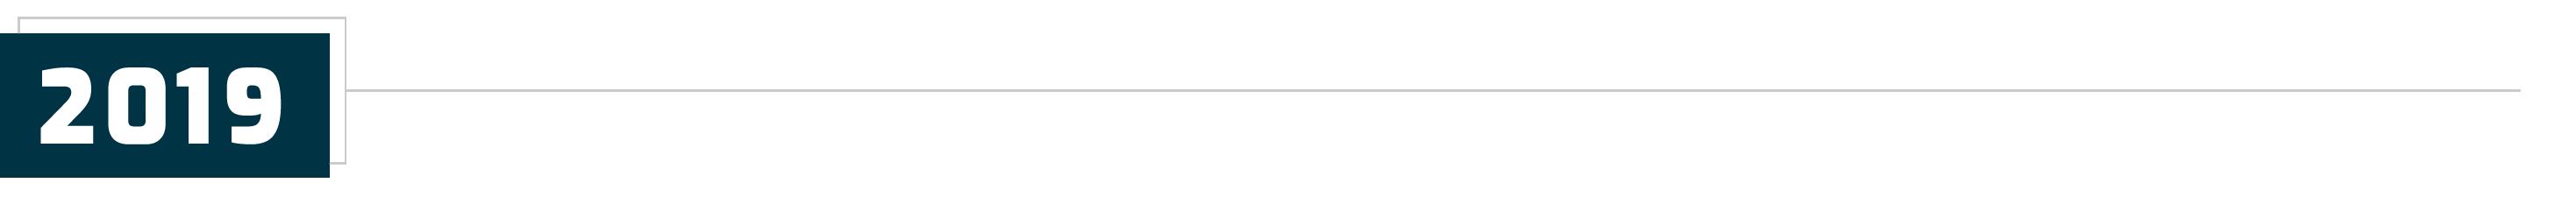 Choice Bank Timeline 2019